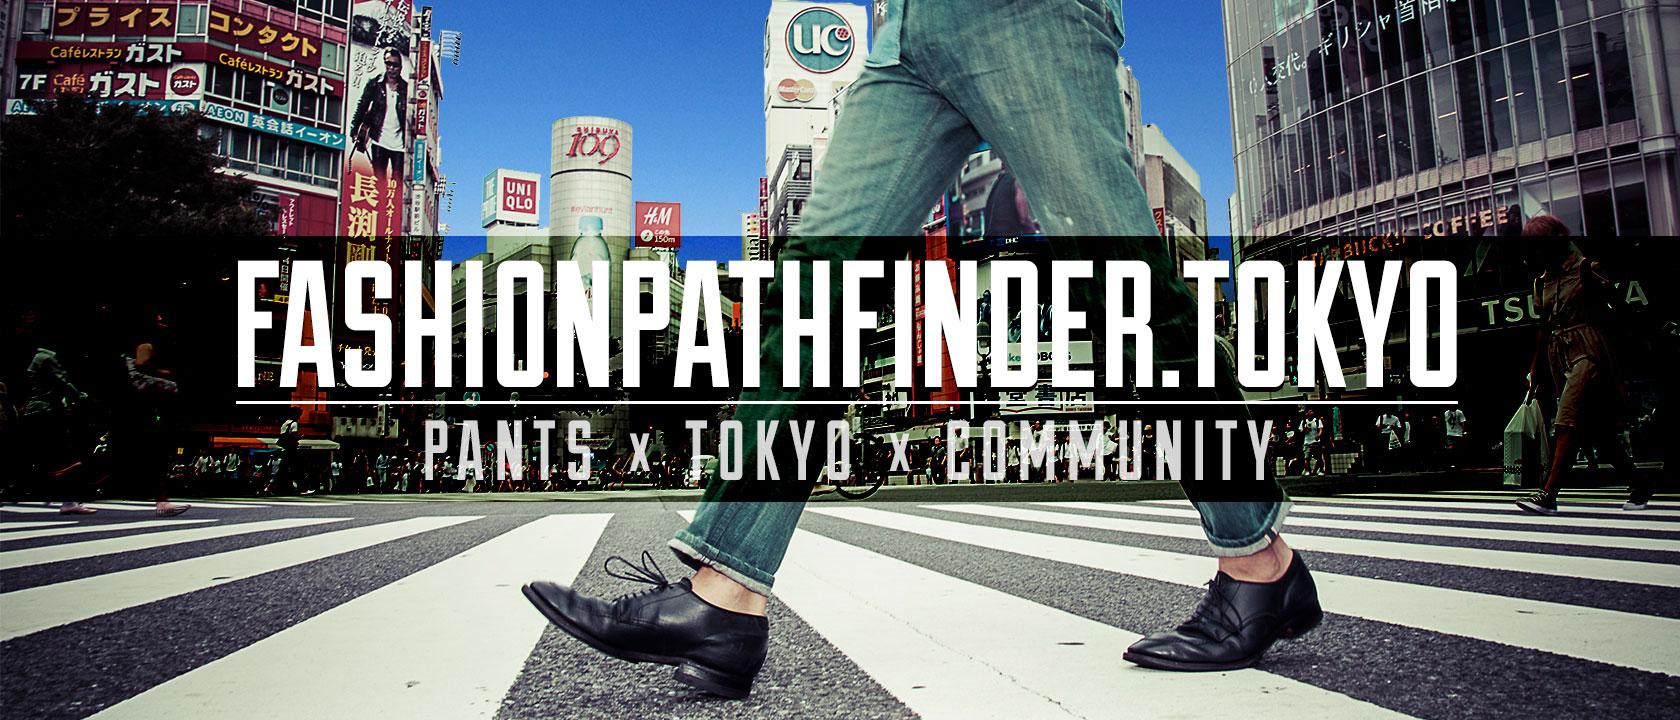 FASHIONPATHFINDER.TOKYO